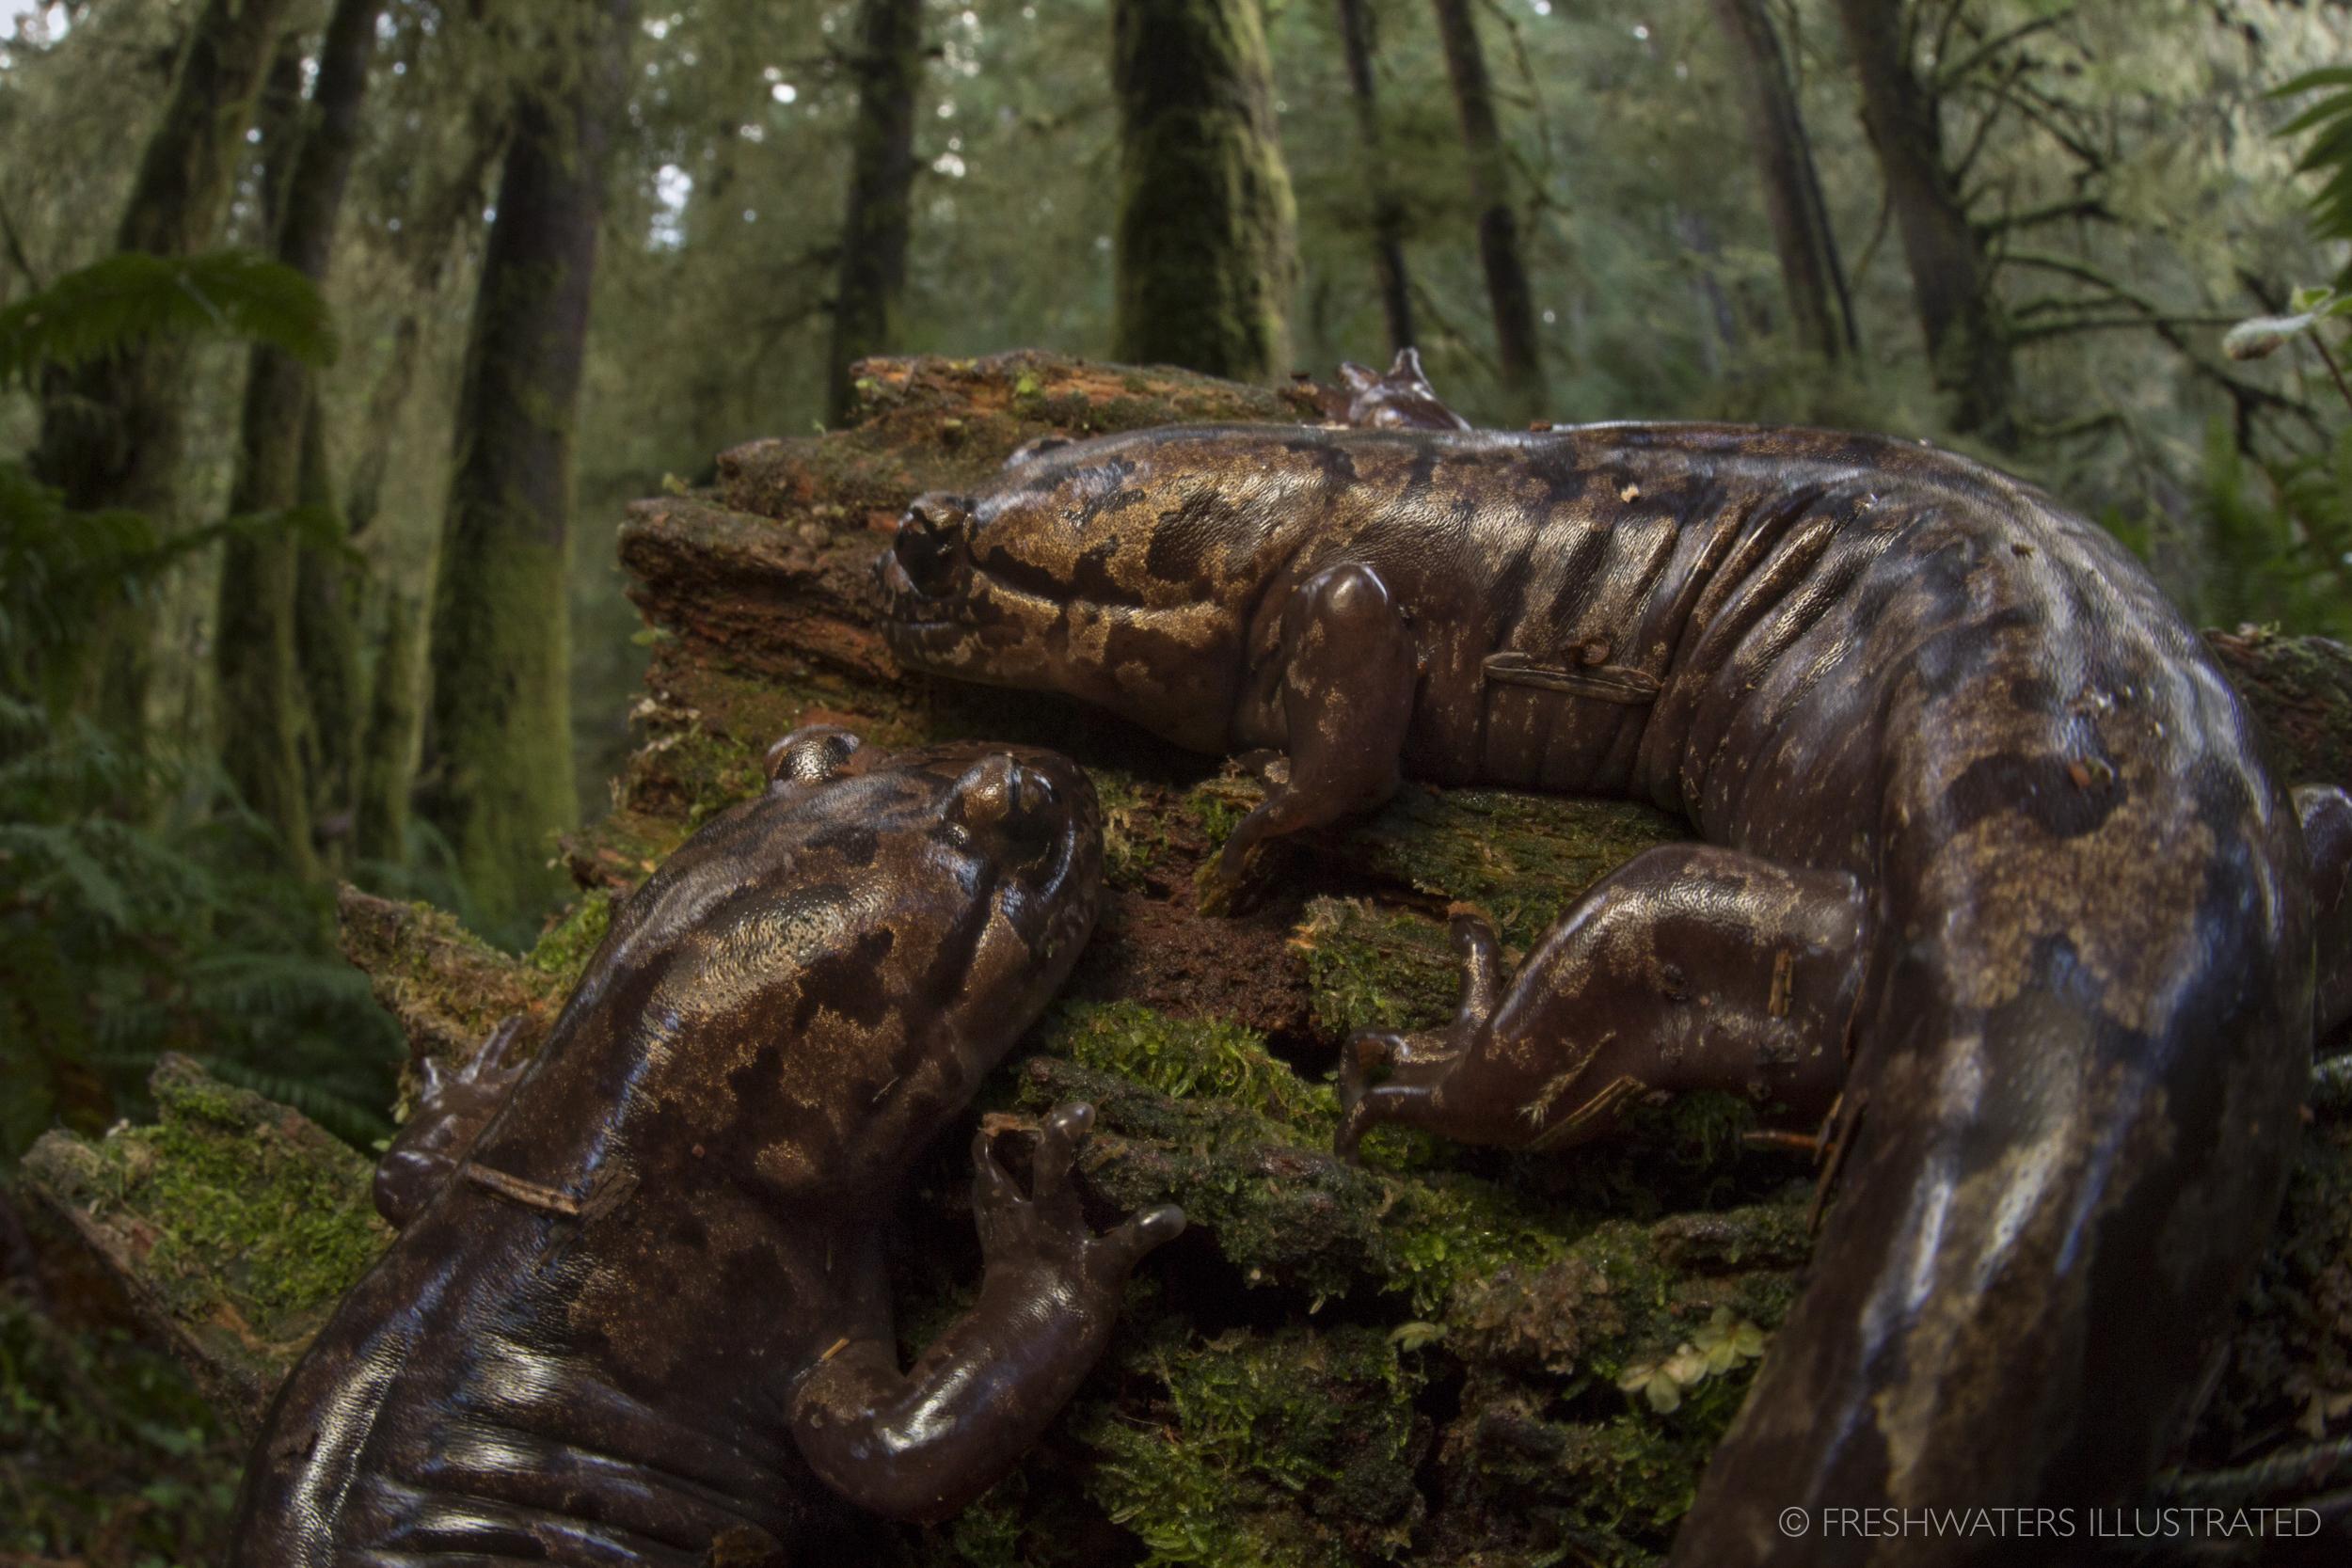 Terrestrial pacific giant salamanders (Dicamptodon tenebrosus) in an old growth forest. Cummins Creek, Oregon  www.FreshwatersIllustrated.org